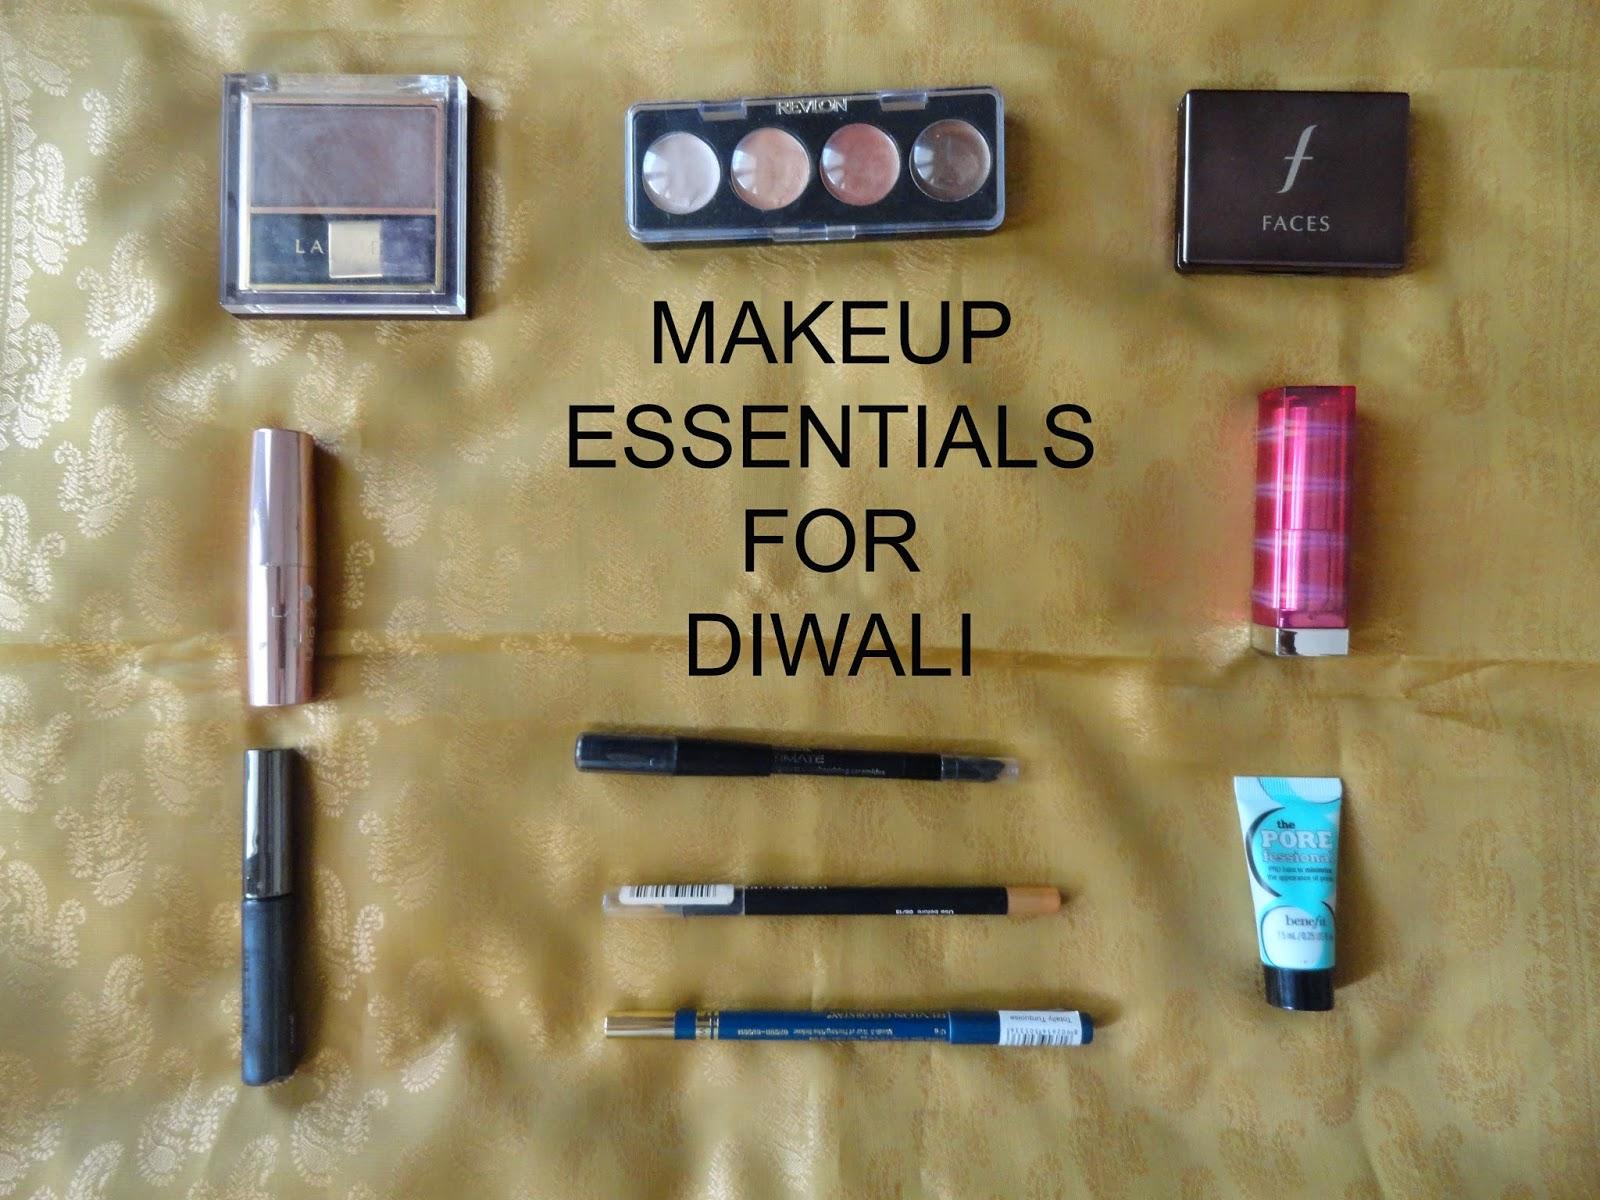 Makeup Essentials for the Festive Season image